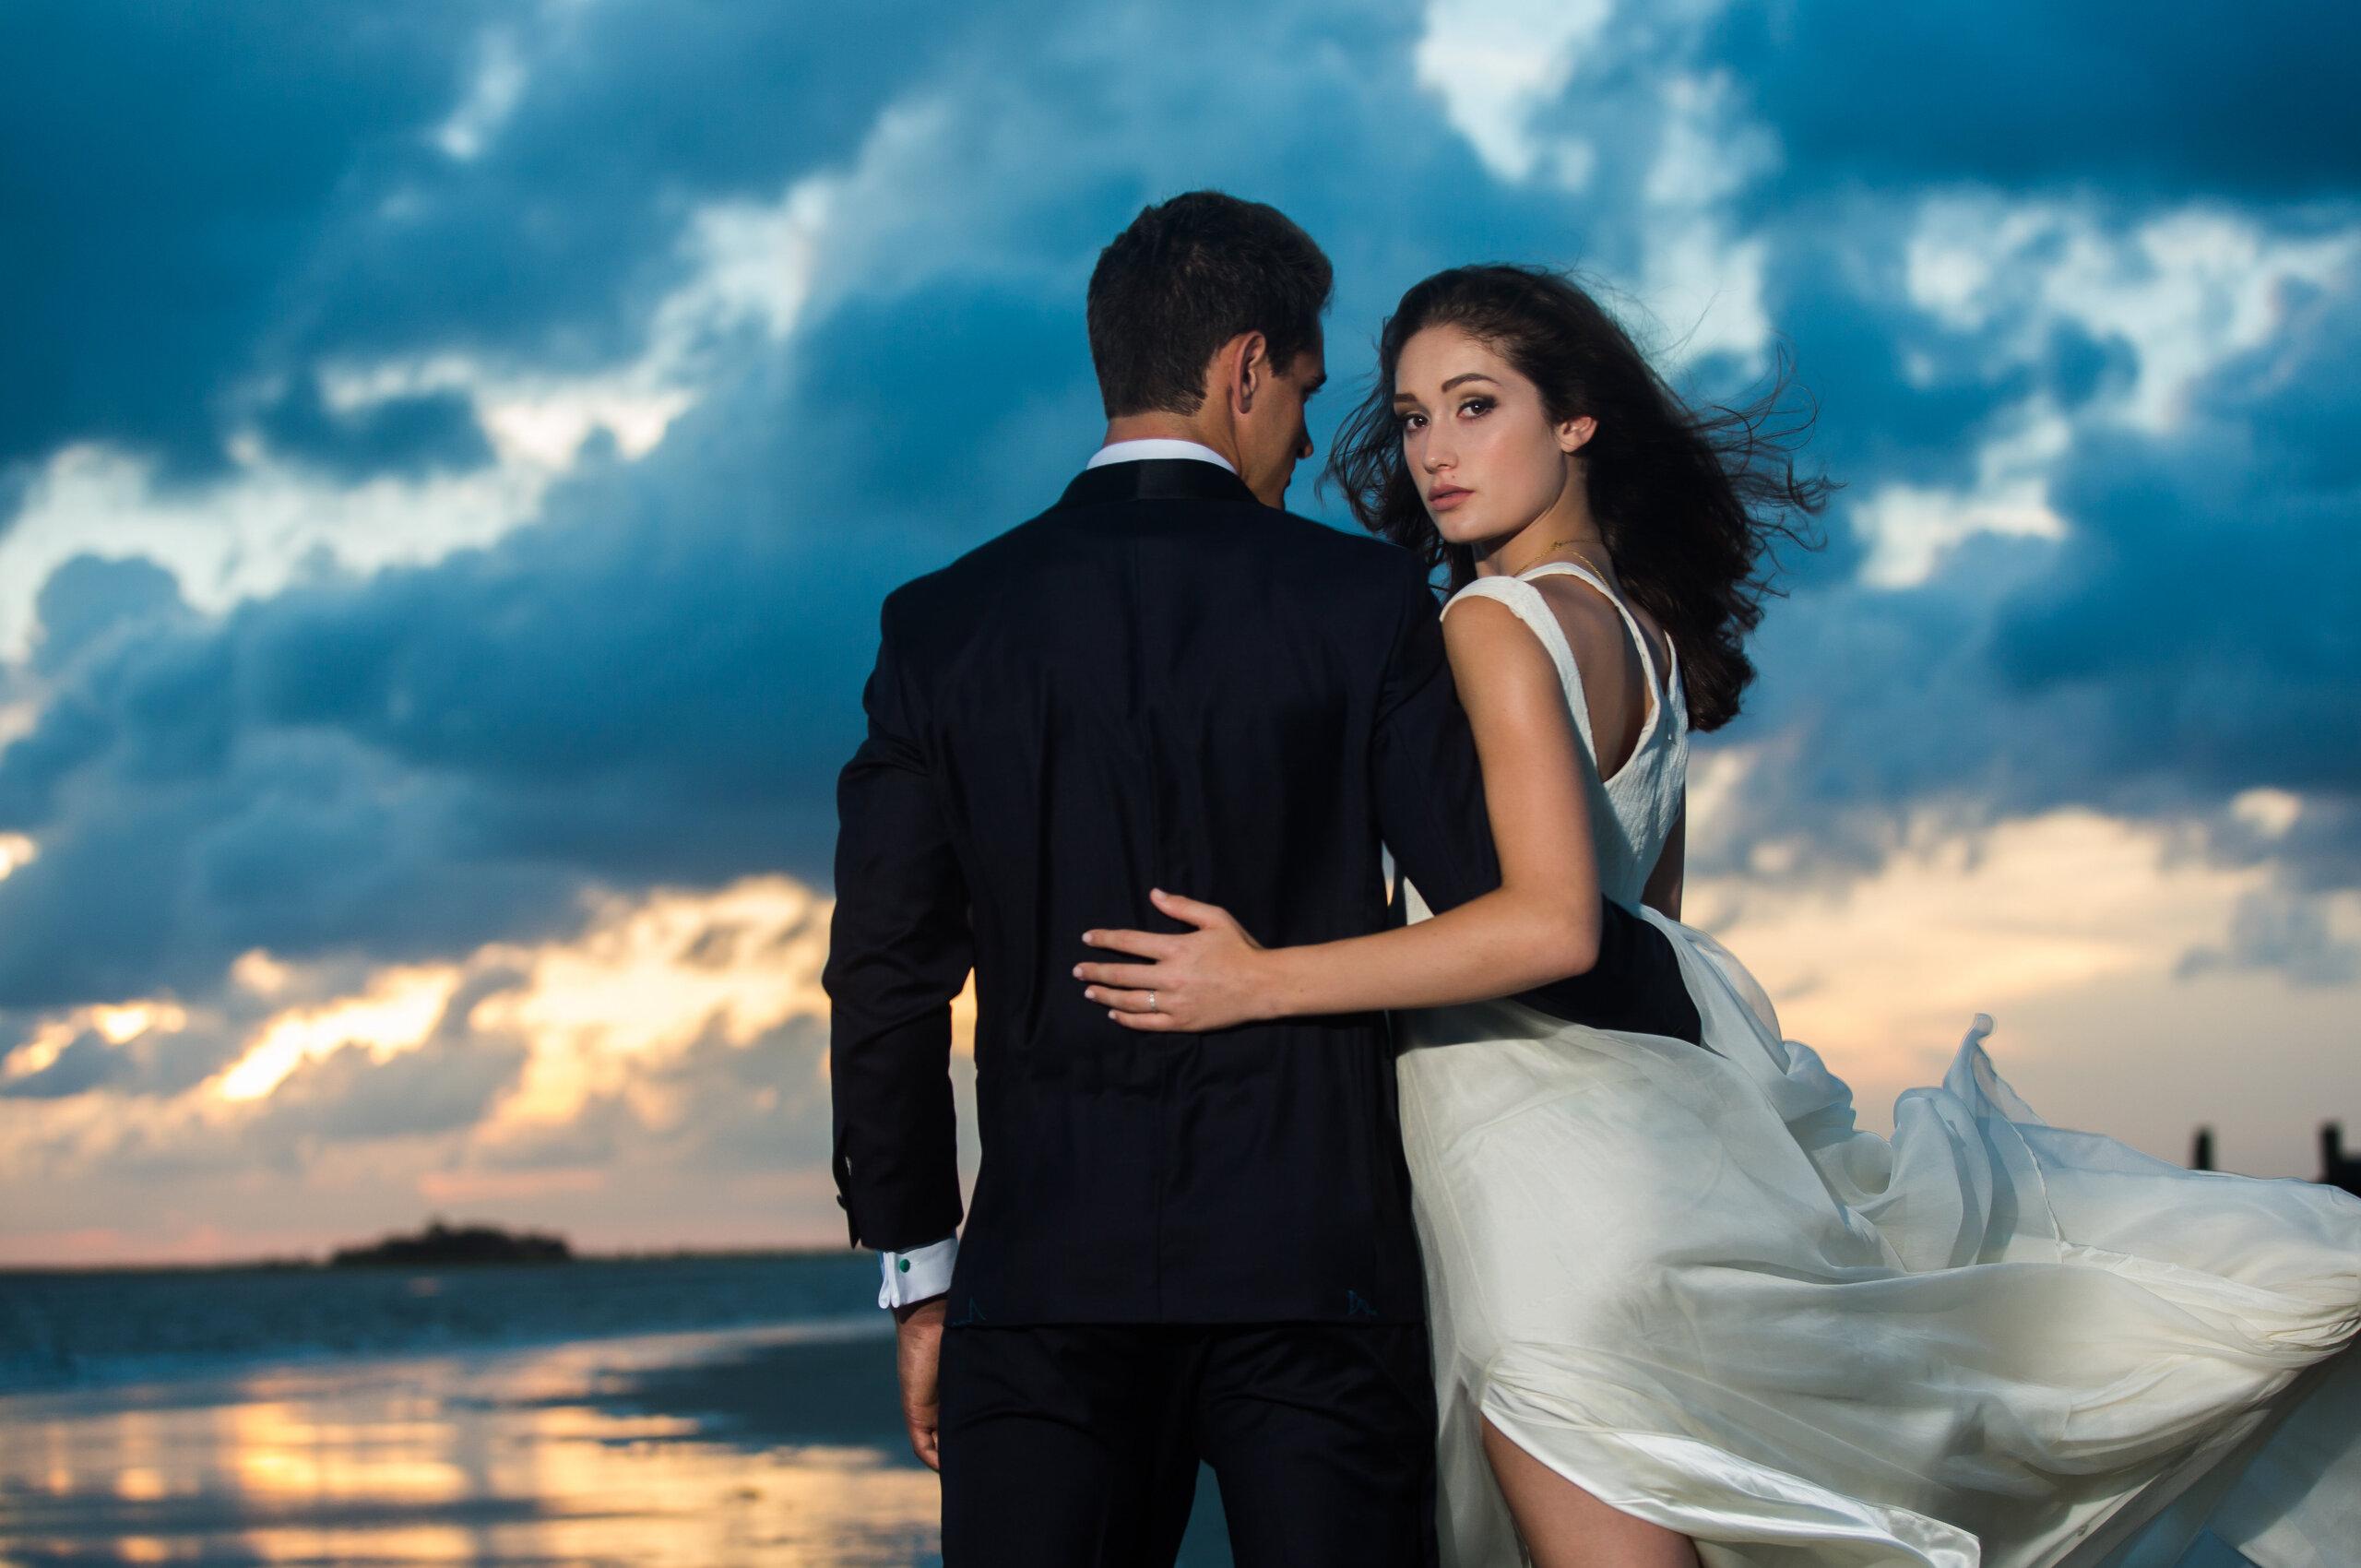 wedding-couple-on-beach-wide.jpg